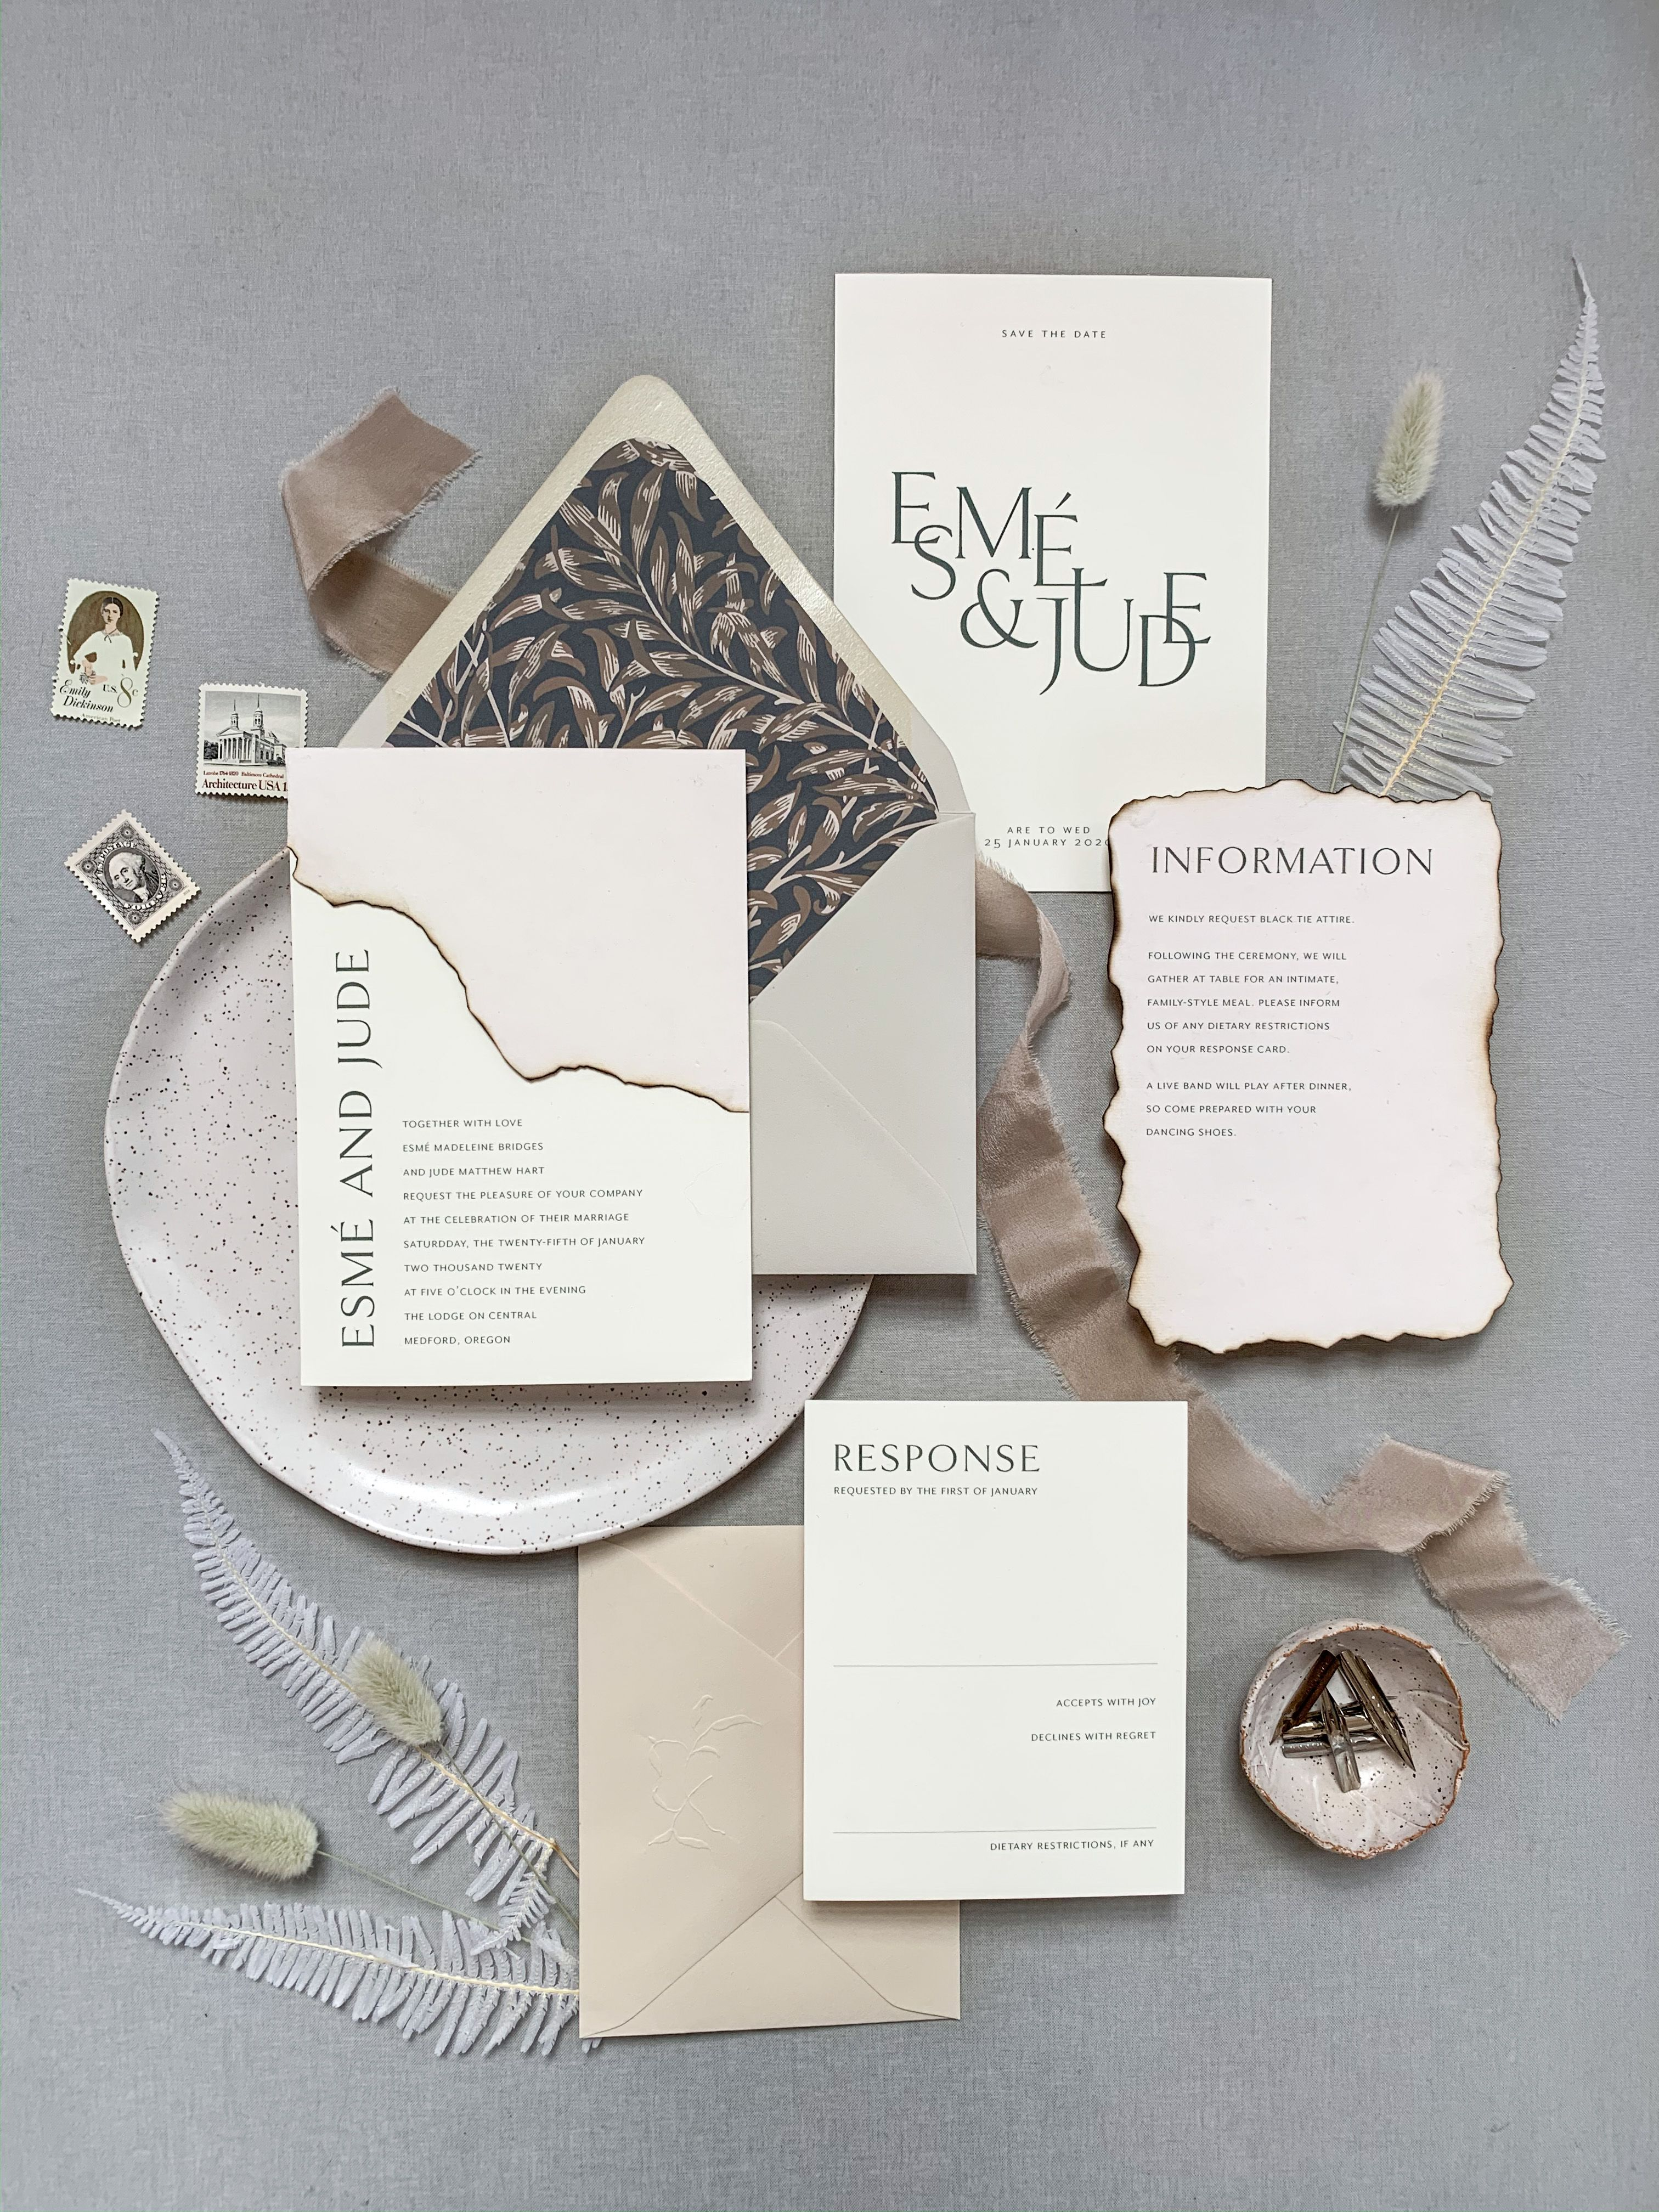 Modern Wedding Invitations With Burned Edges Unique Wedding Stationery Wedding Invitation Design Unique Wedding Invitations